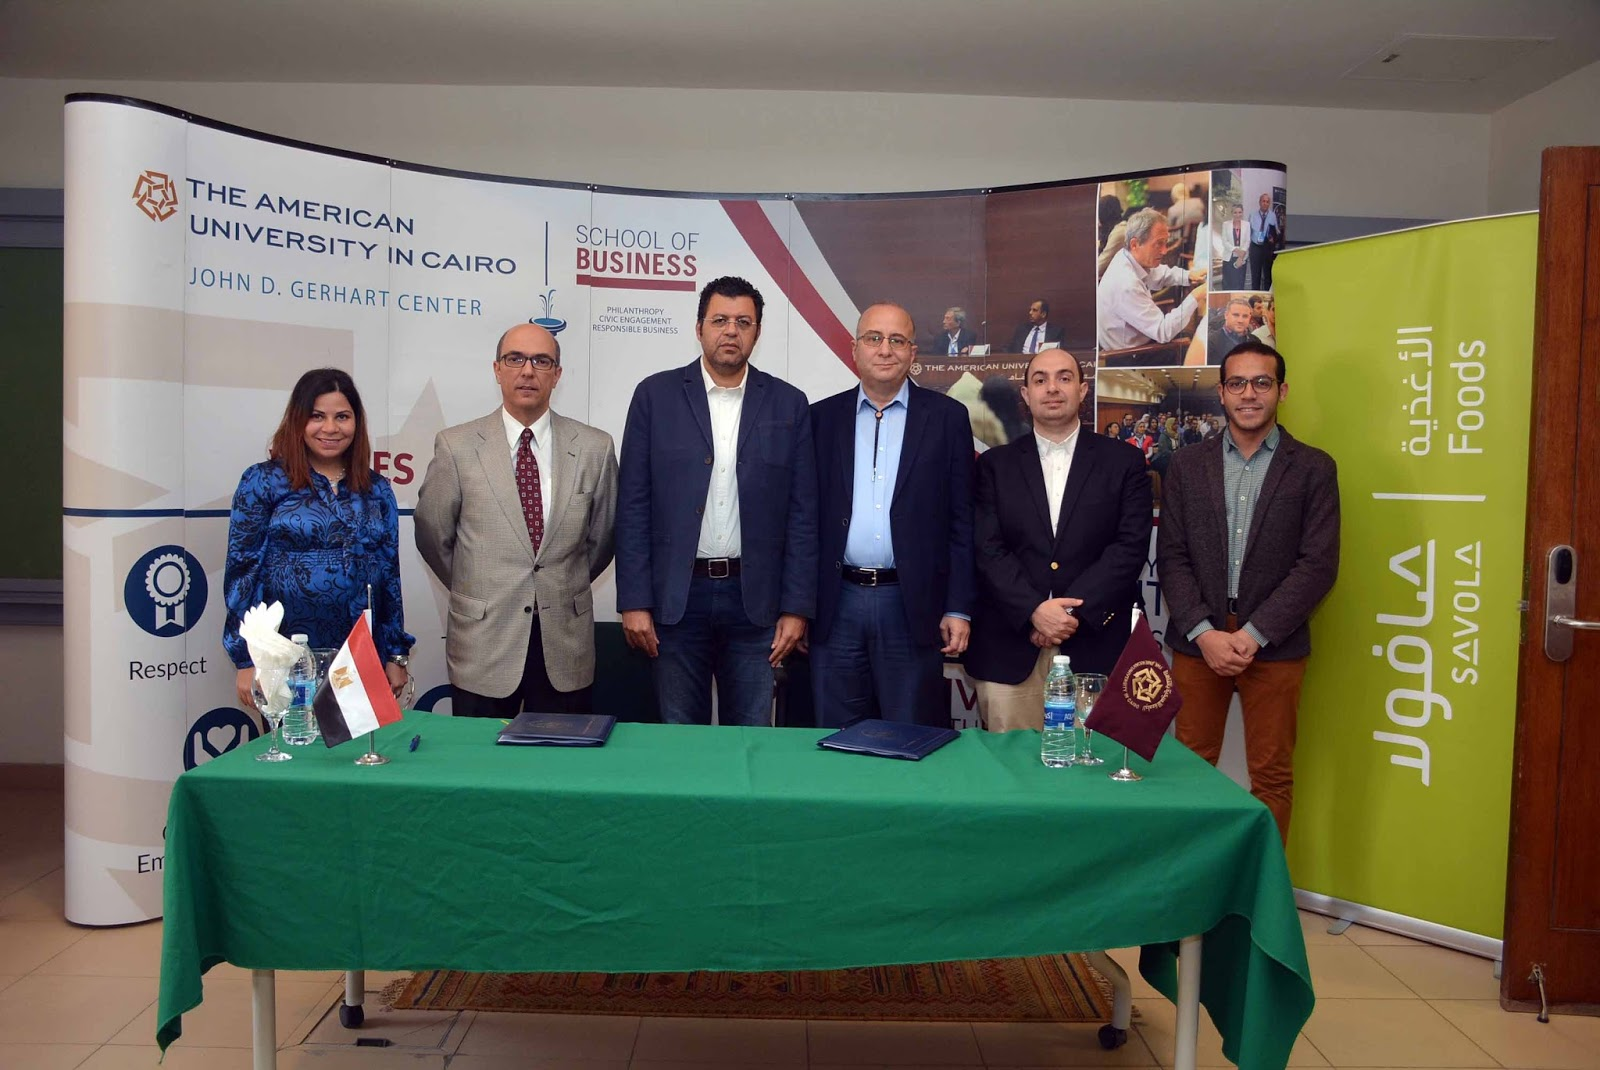 Company News in Egypt: AUC'S GERHART CENTER HOLDS SOCIAL